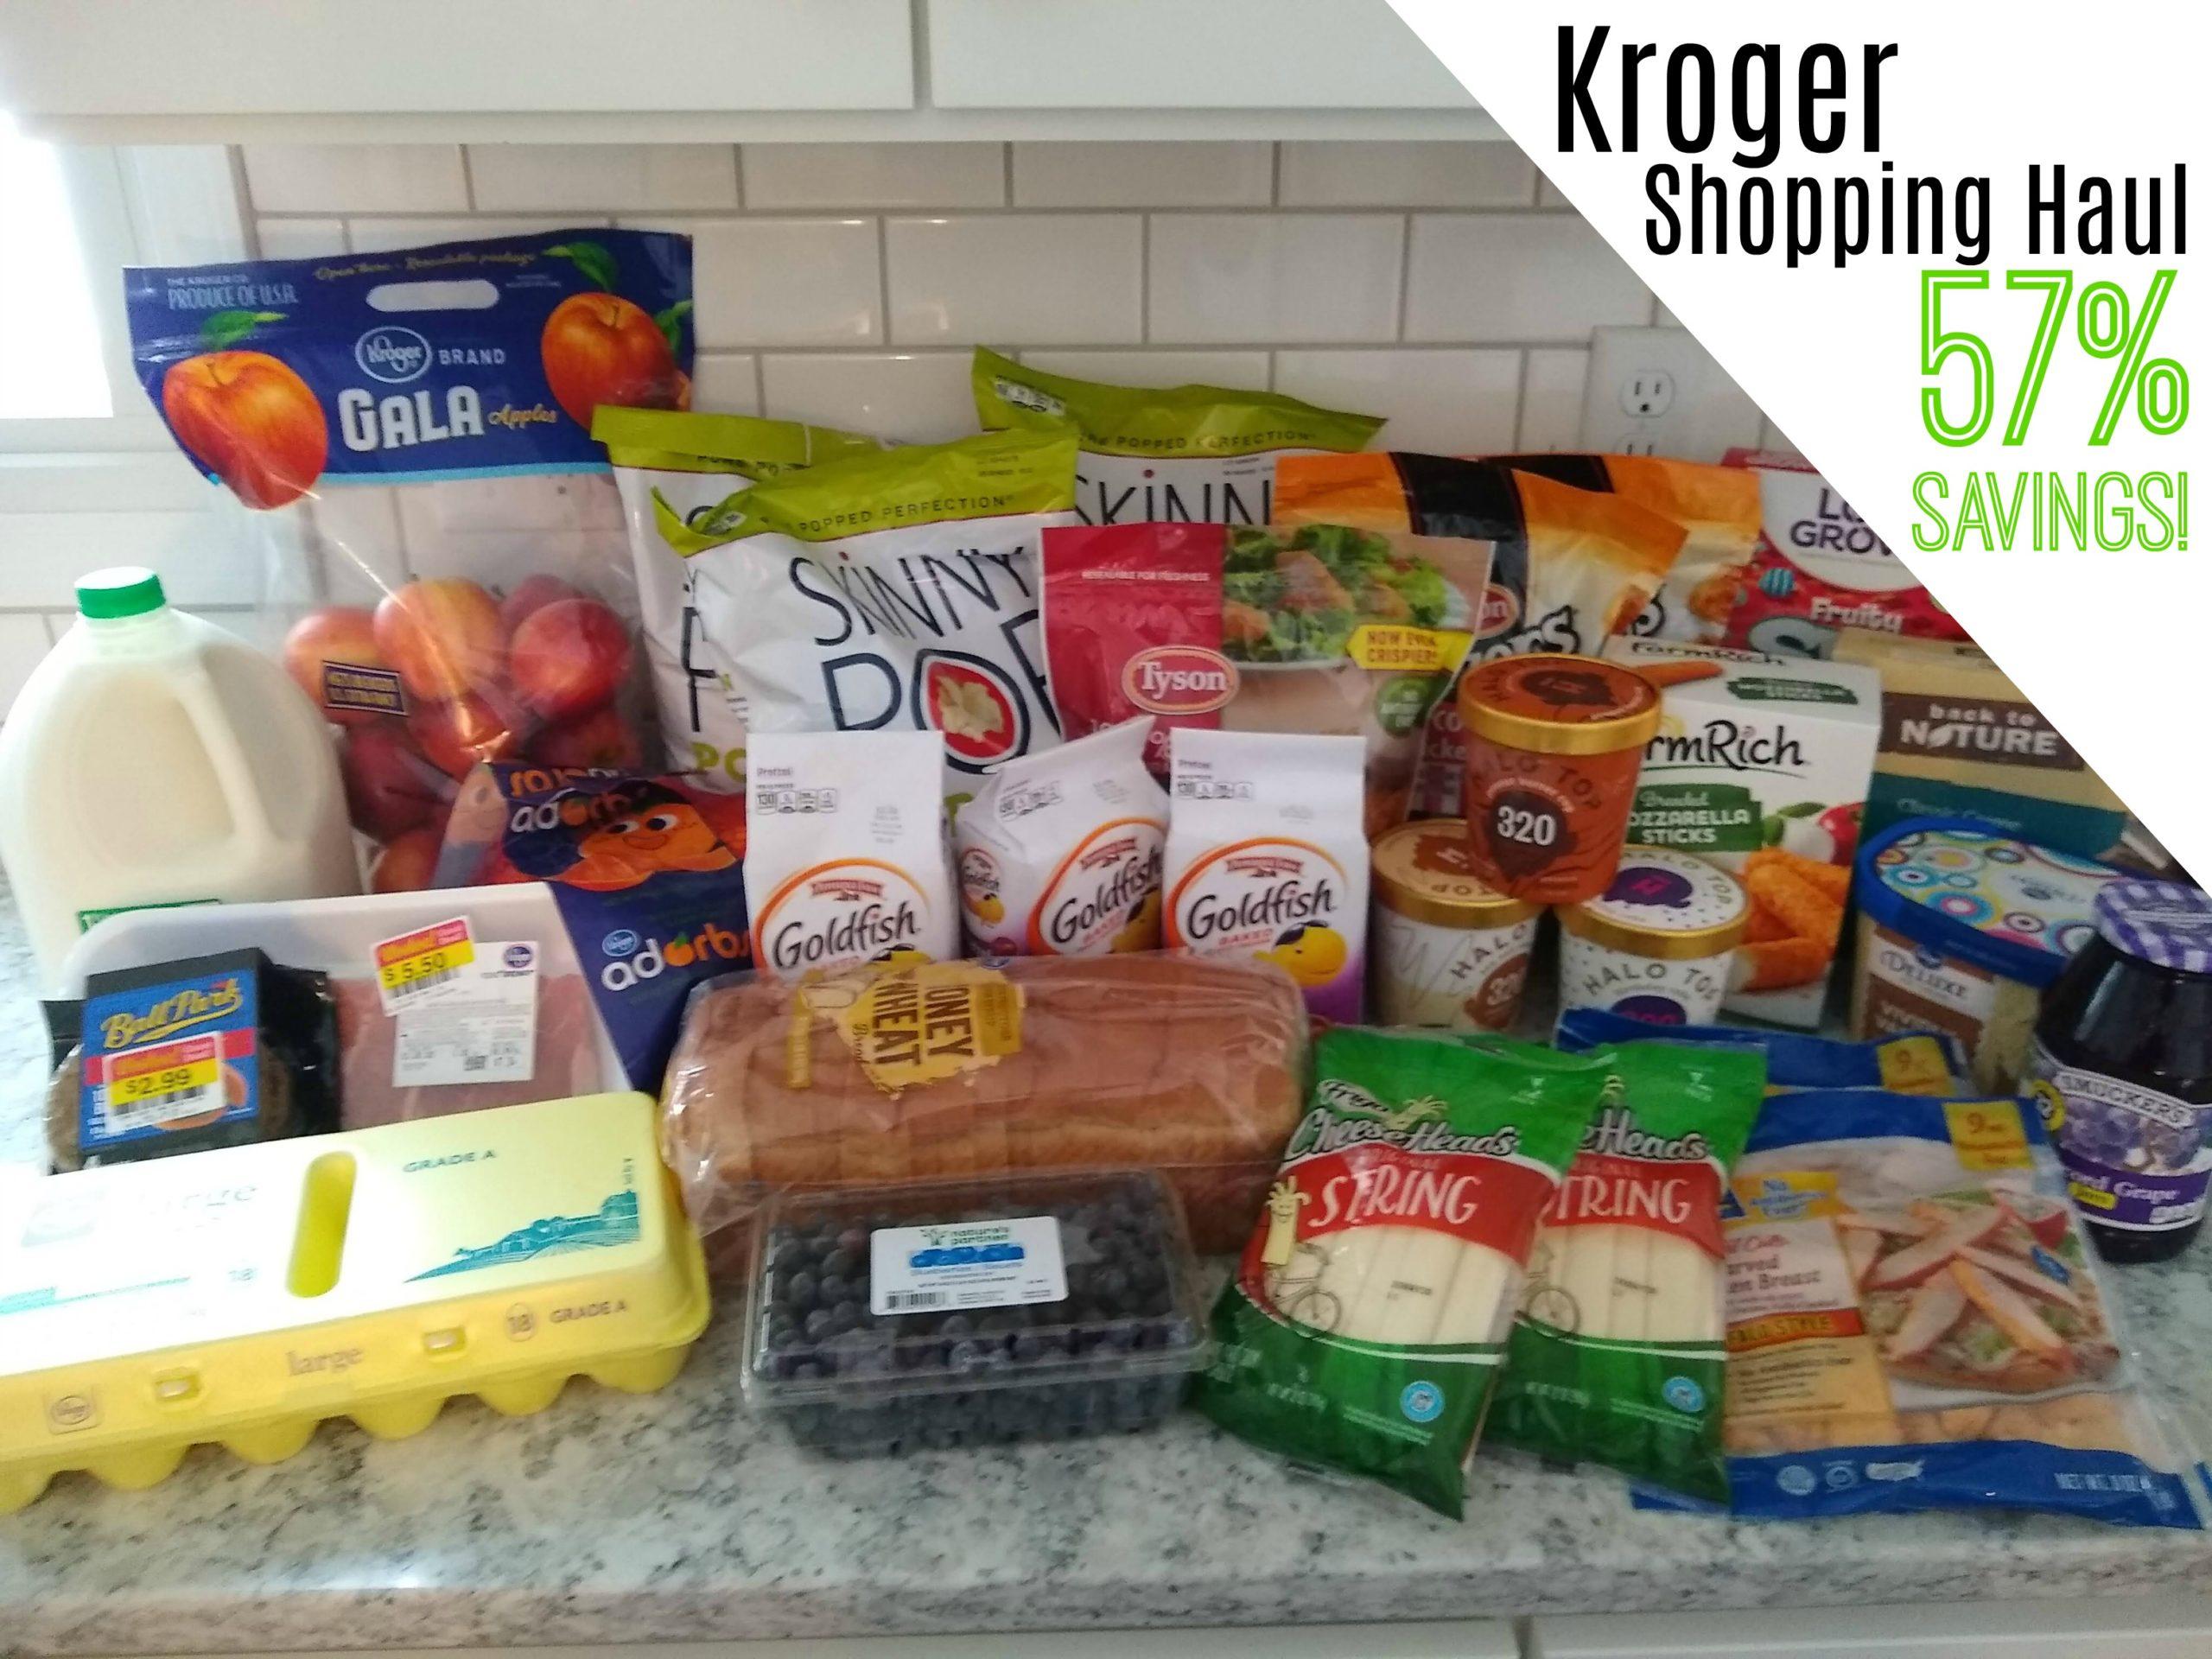 Kroger Shopping Haul – 57% Savings!